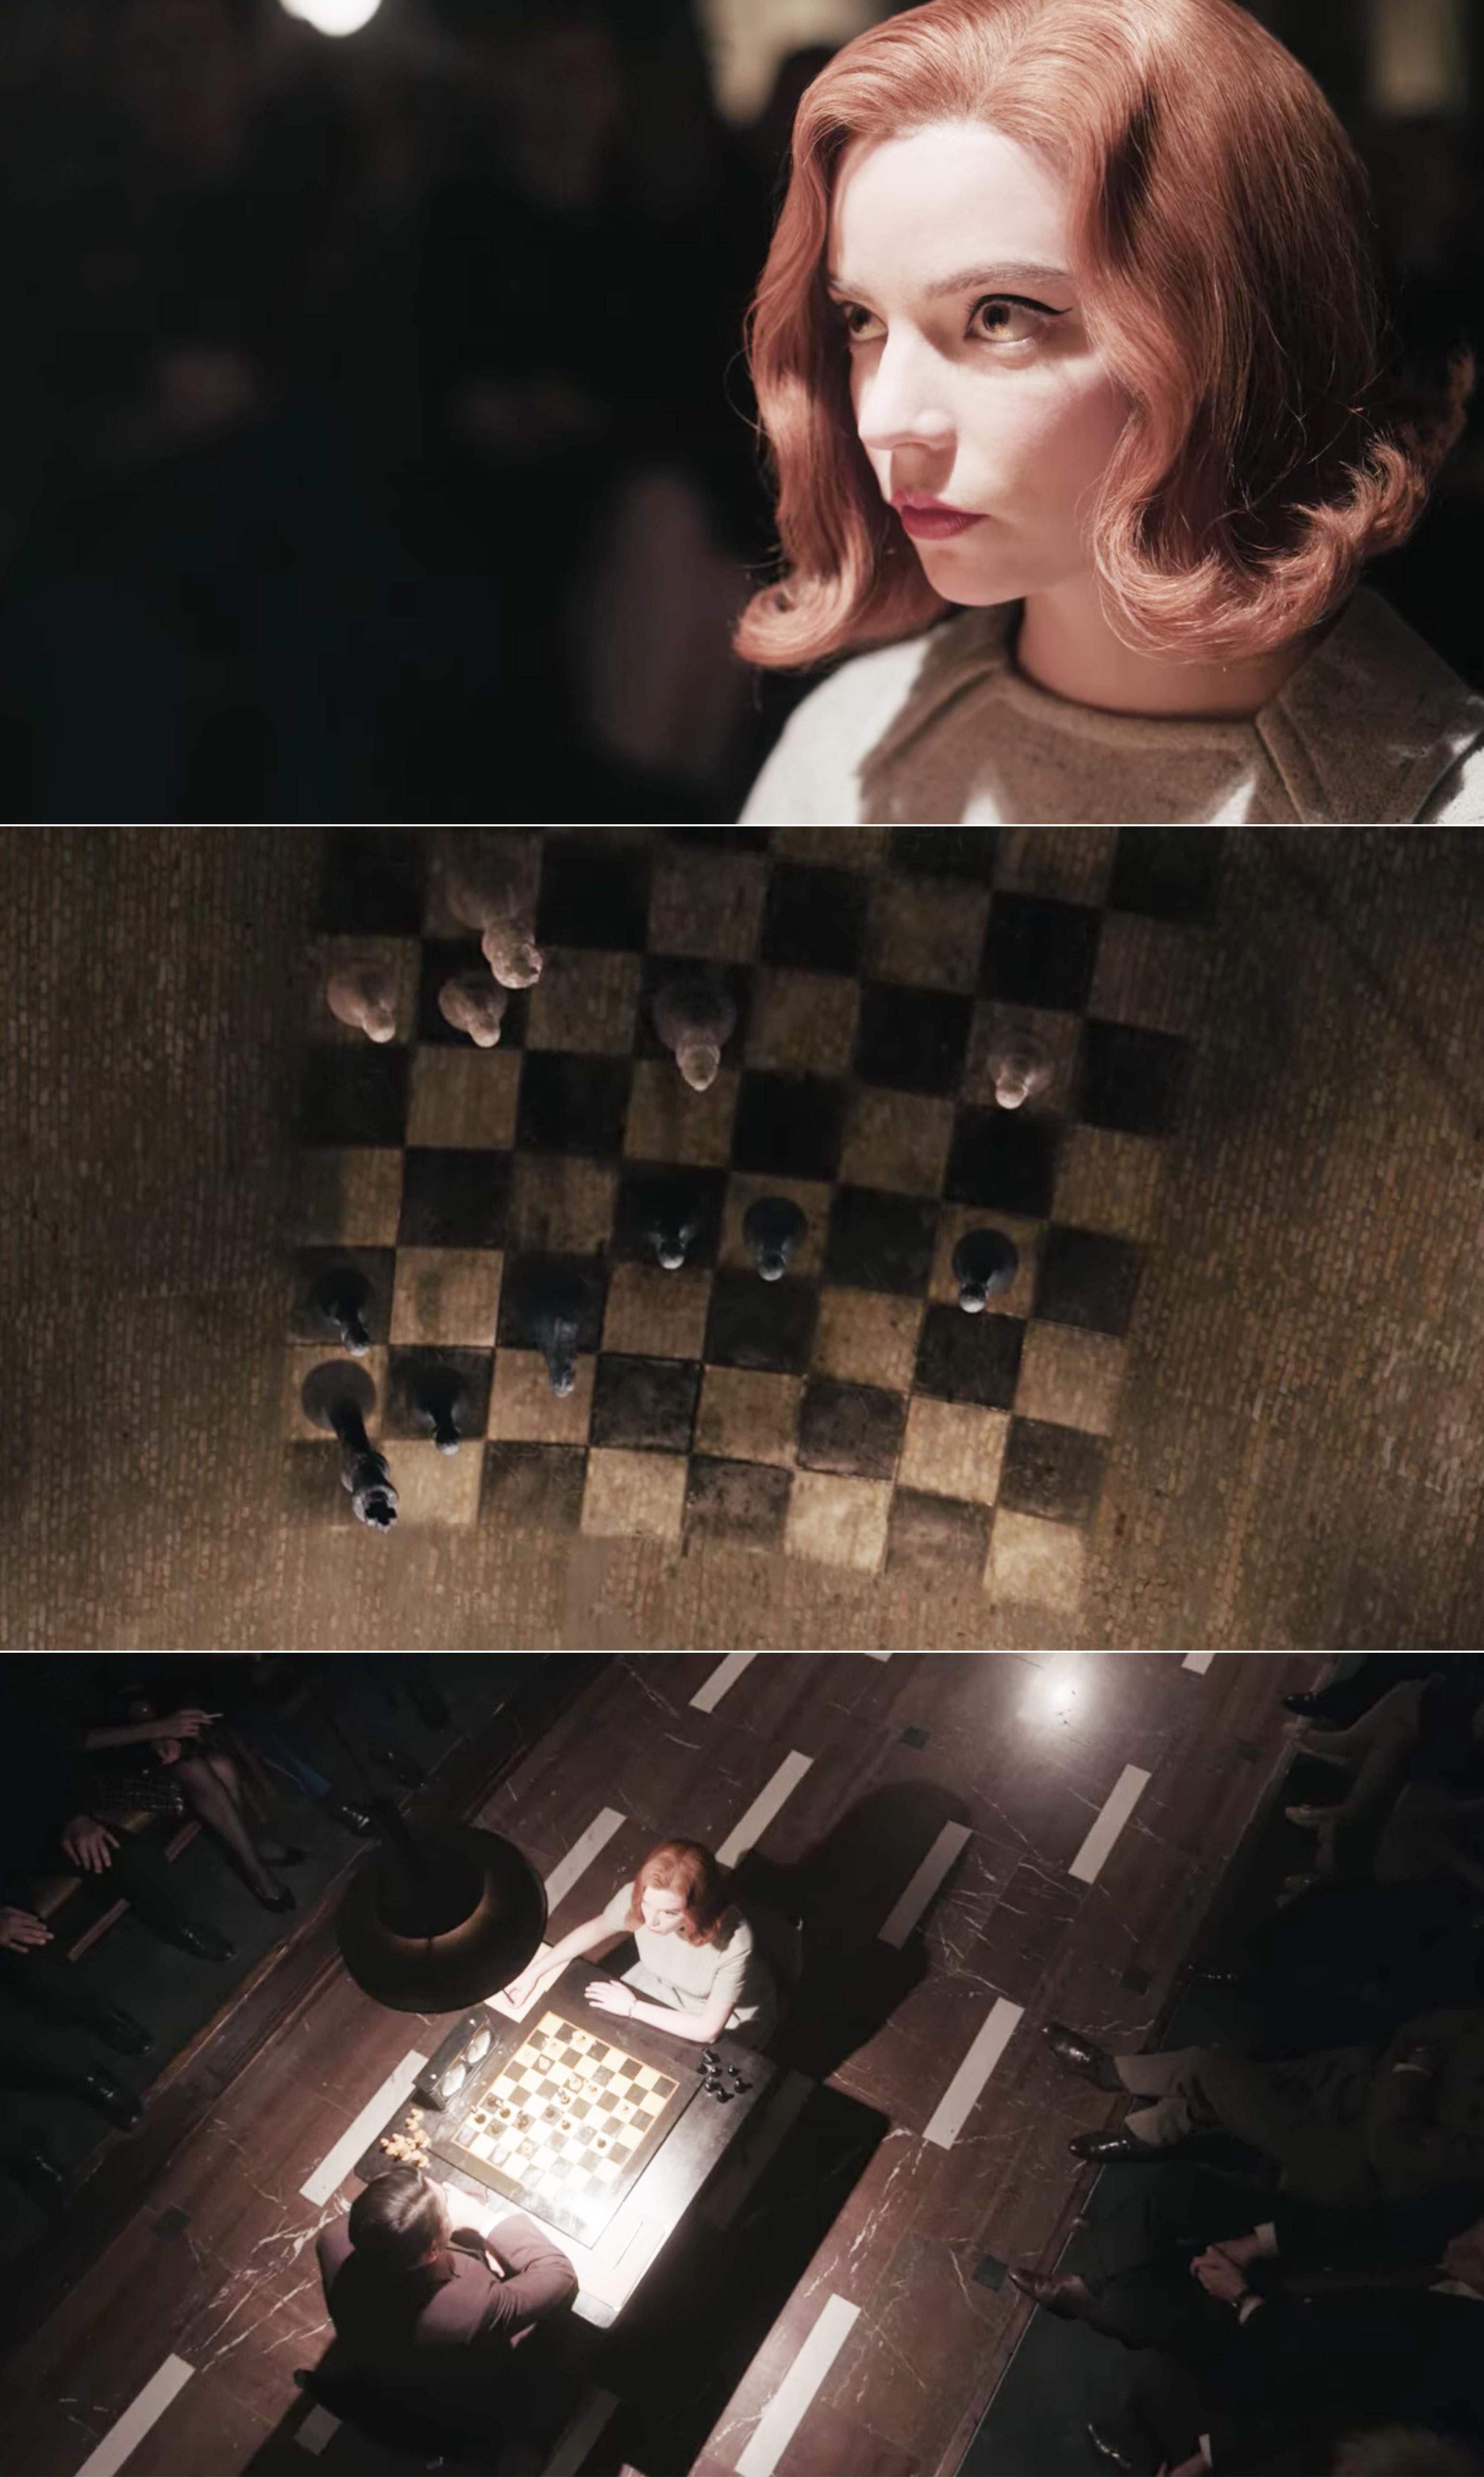 Beth playing Borgov in chess